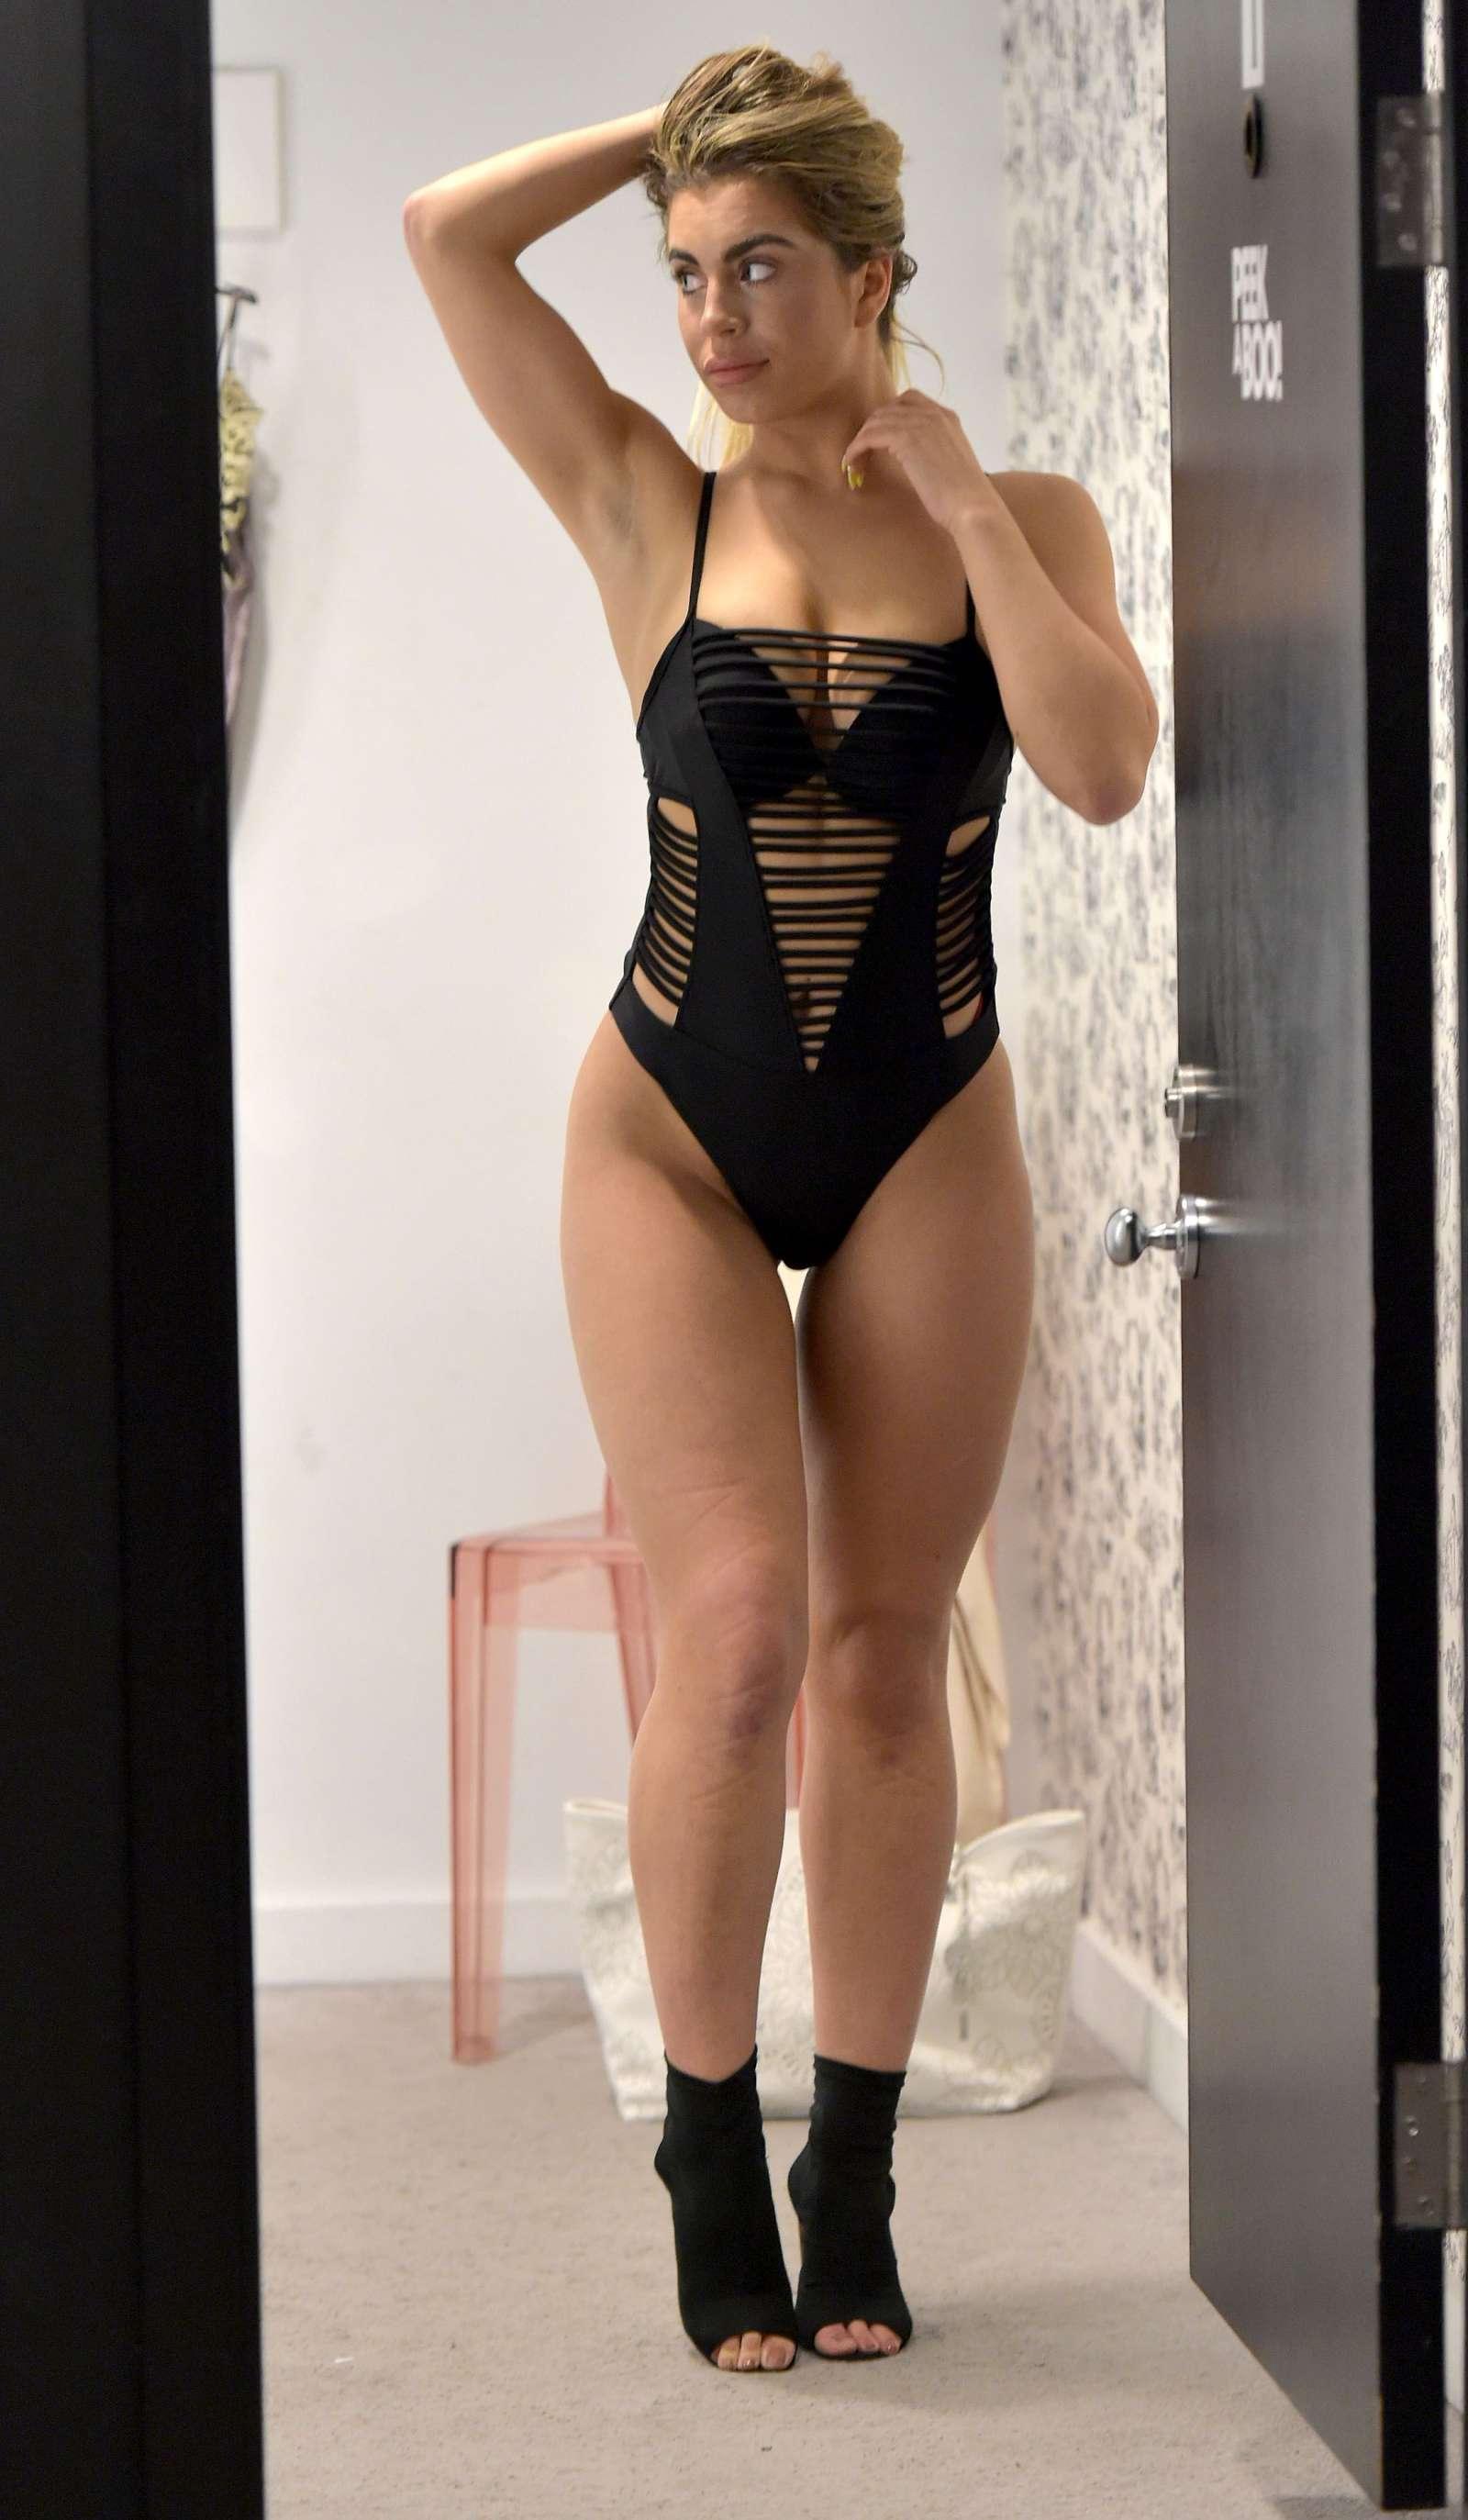 Selfie Katie Salmon  nudes (68 pictures), YouTube, butt